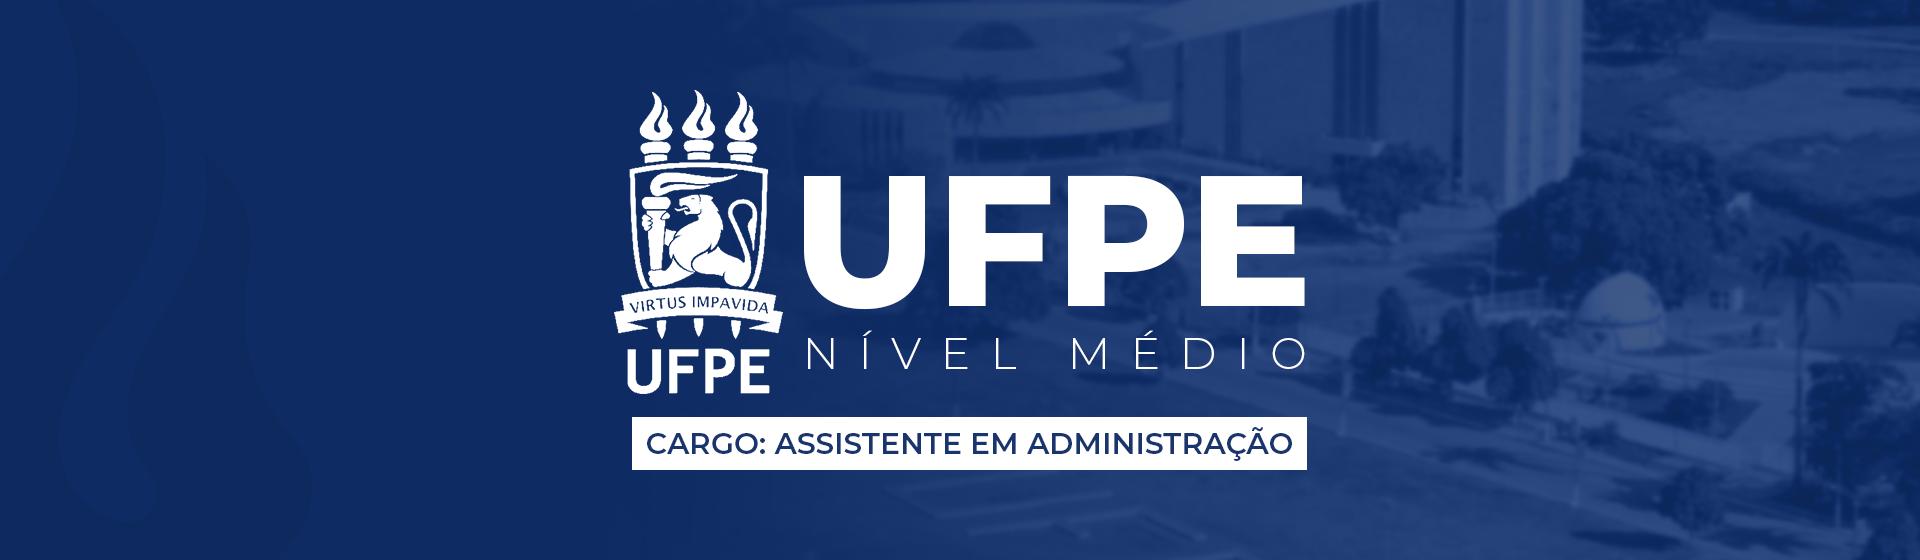 Banner ufpe